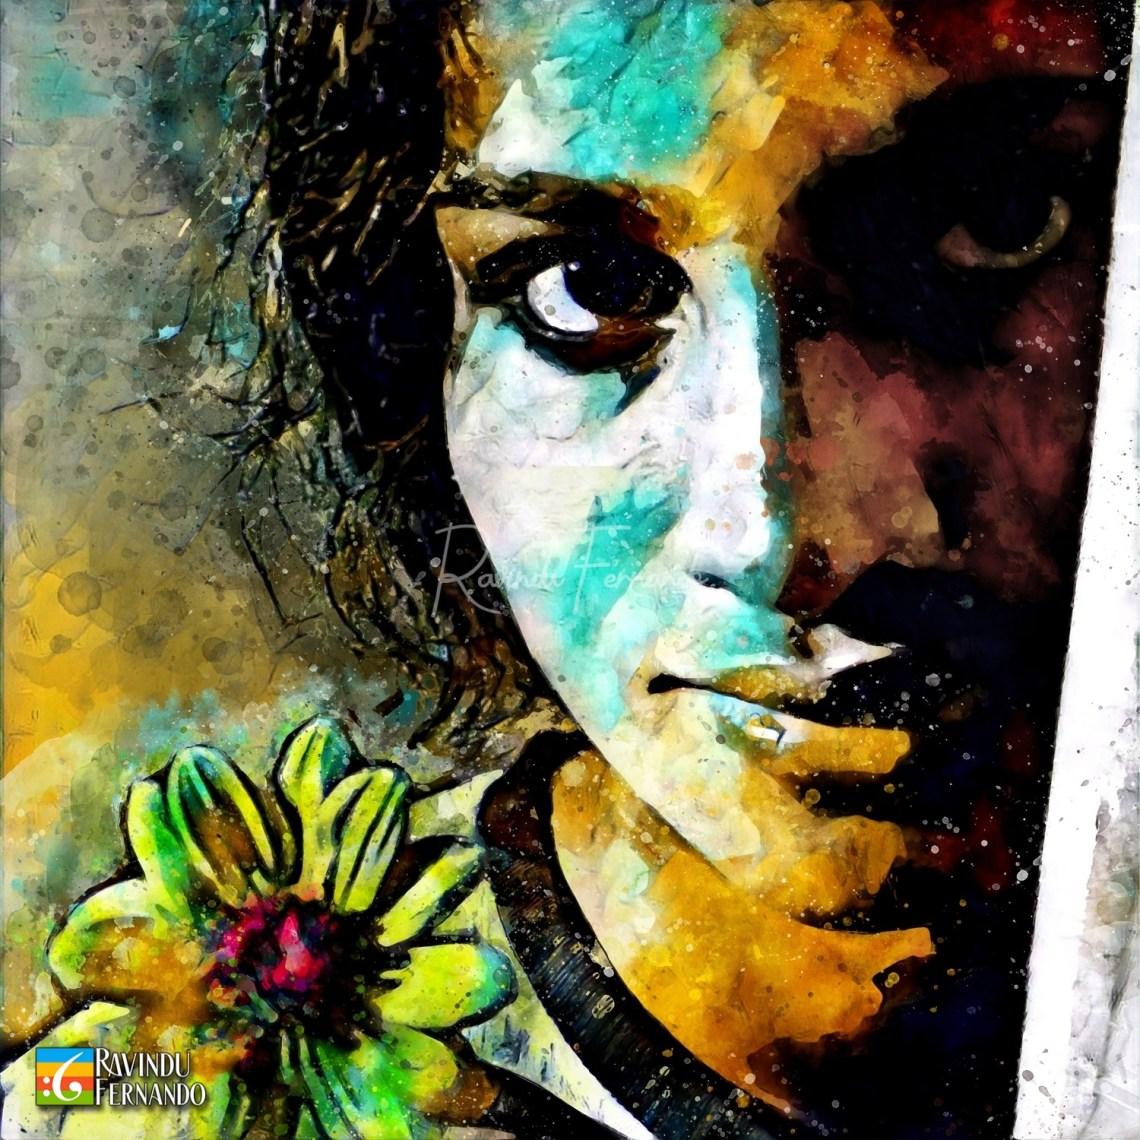 Swarna Mallawarachchi - Digital Watercolor Painting